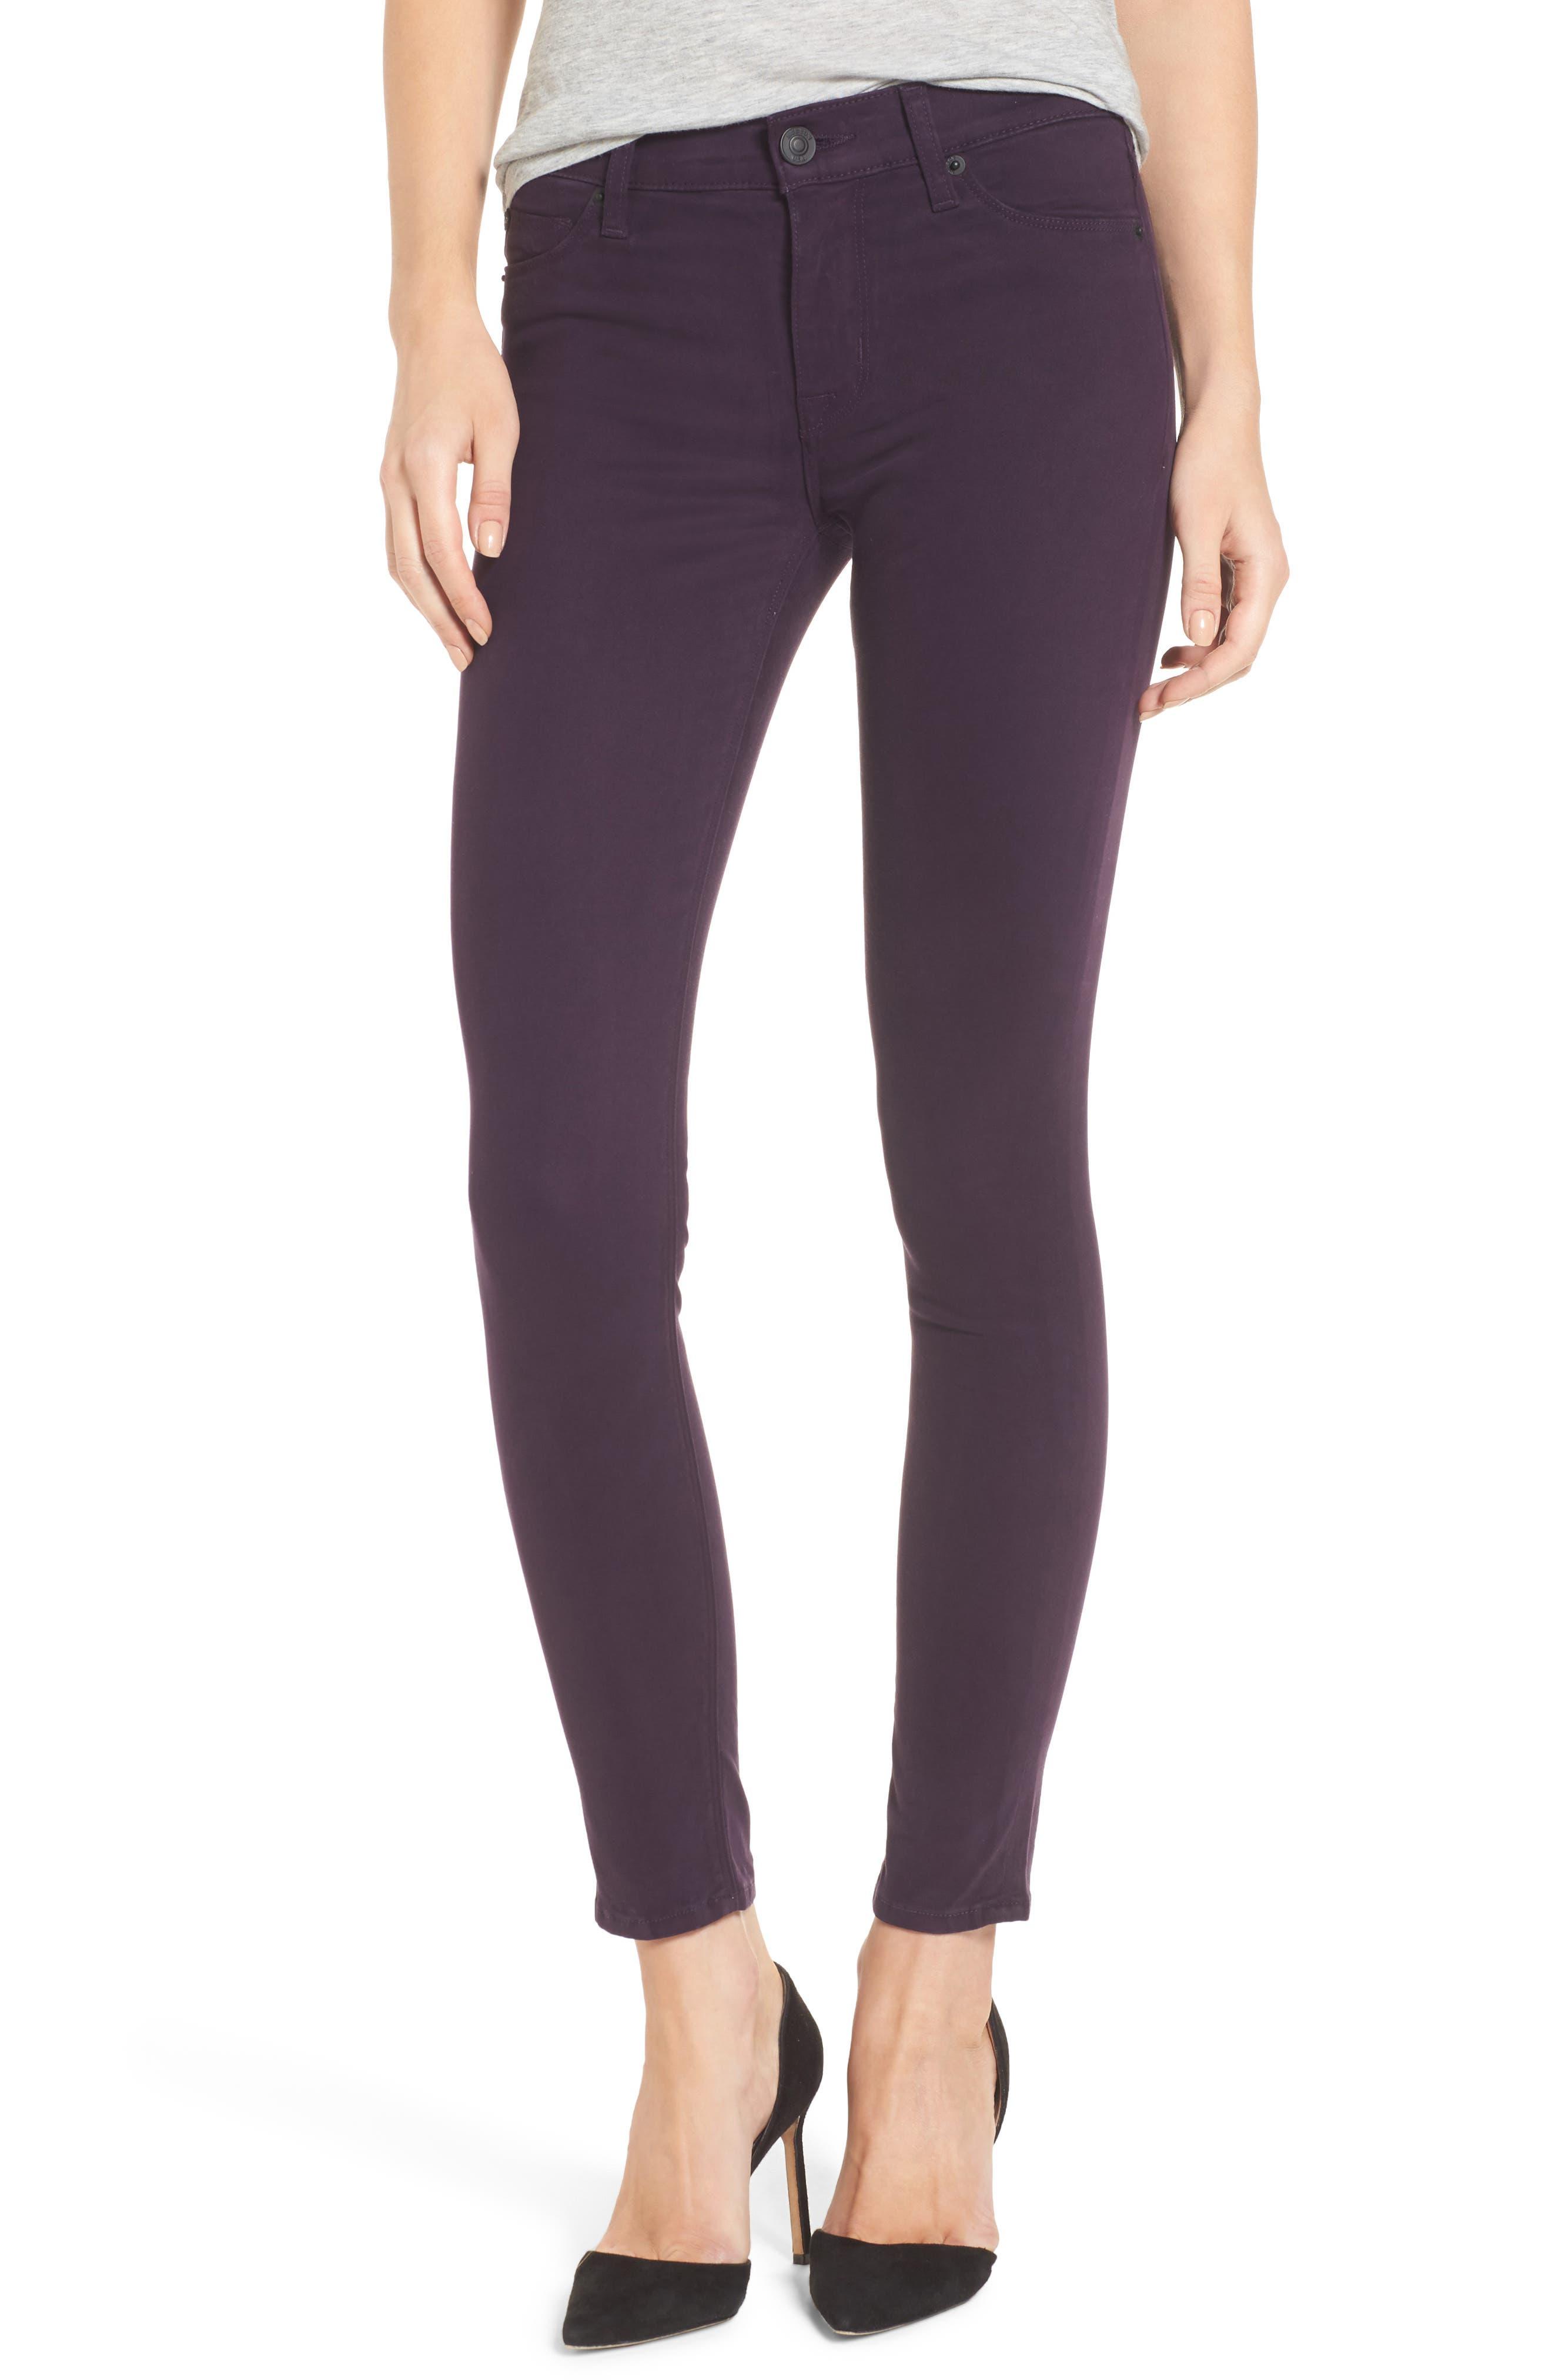 Nico Ankle Skinny Pants,                             Main thumbnail 1, color,                             Velvet Plum